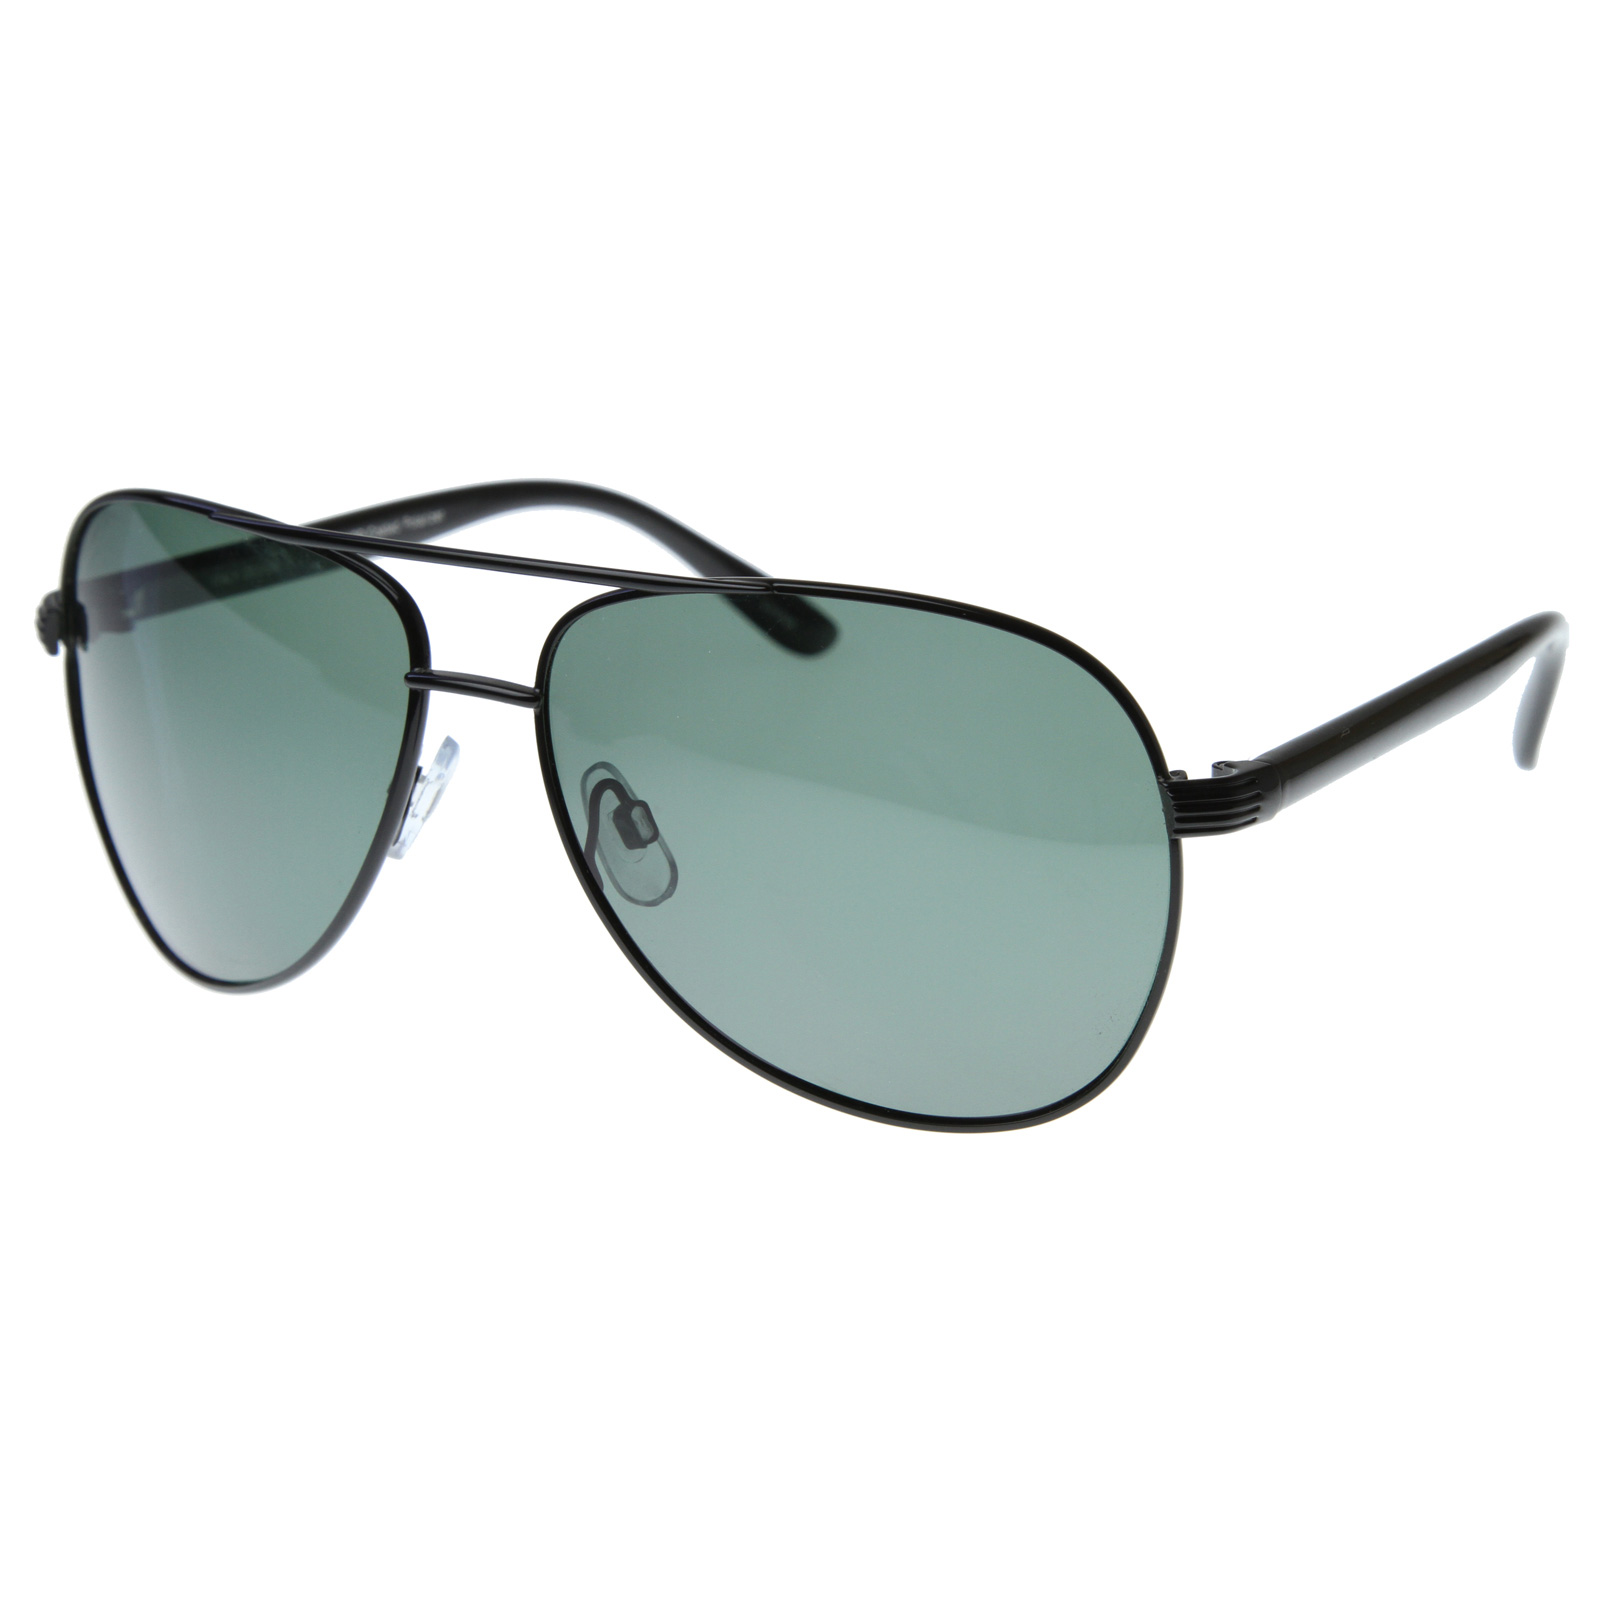 High-Grade-Premium-Polarized-Large-Classic-Metal-Square-Aviator-Sunglasses-8320